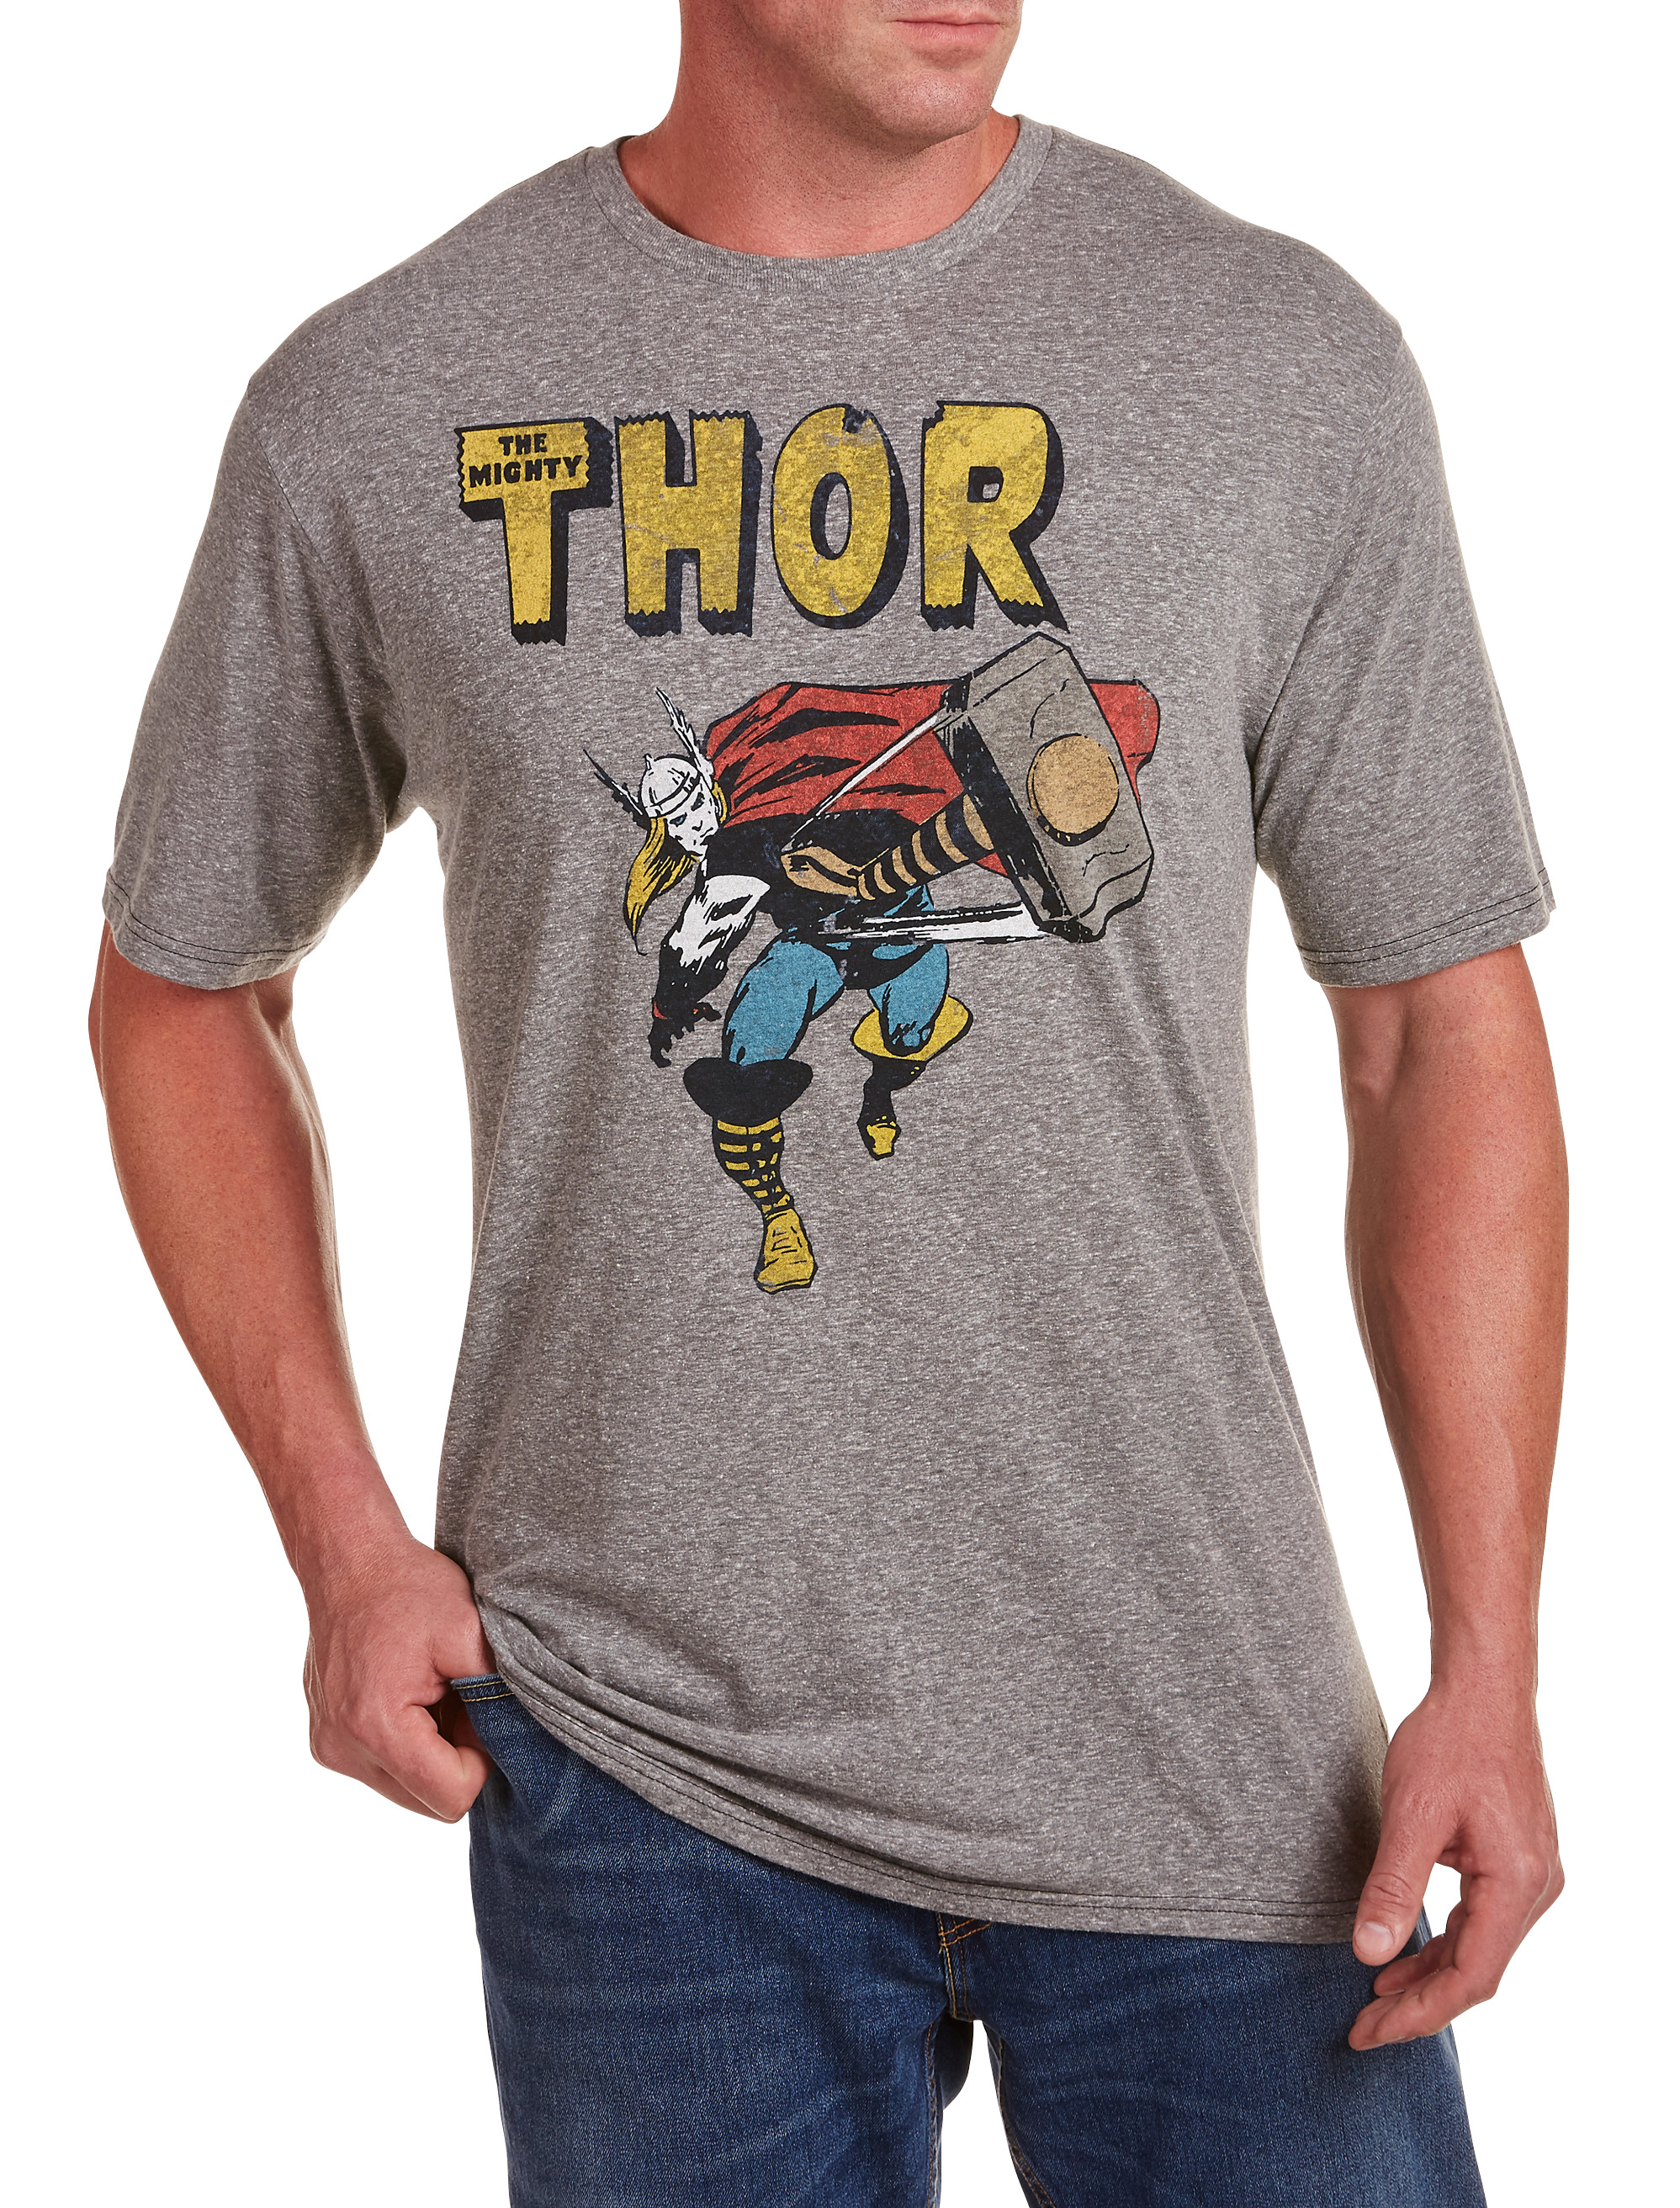 Retro Brand Thor Graphic Tee | Tuggl